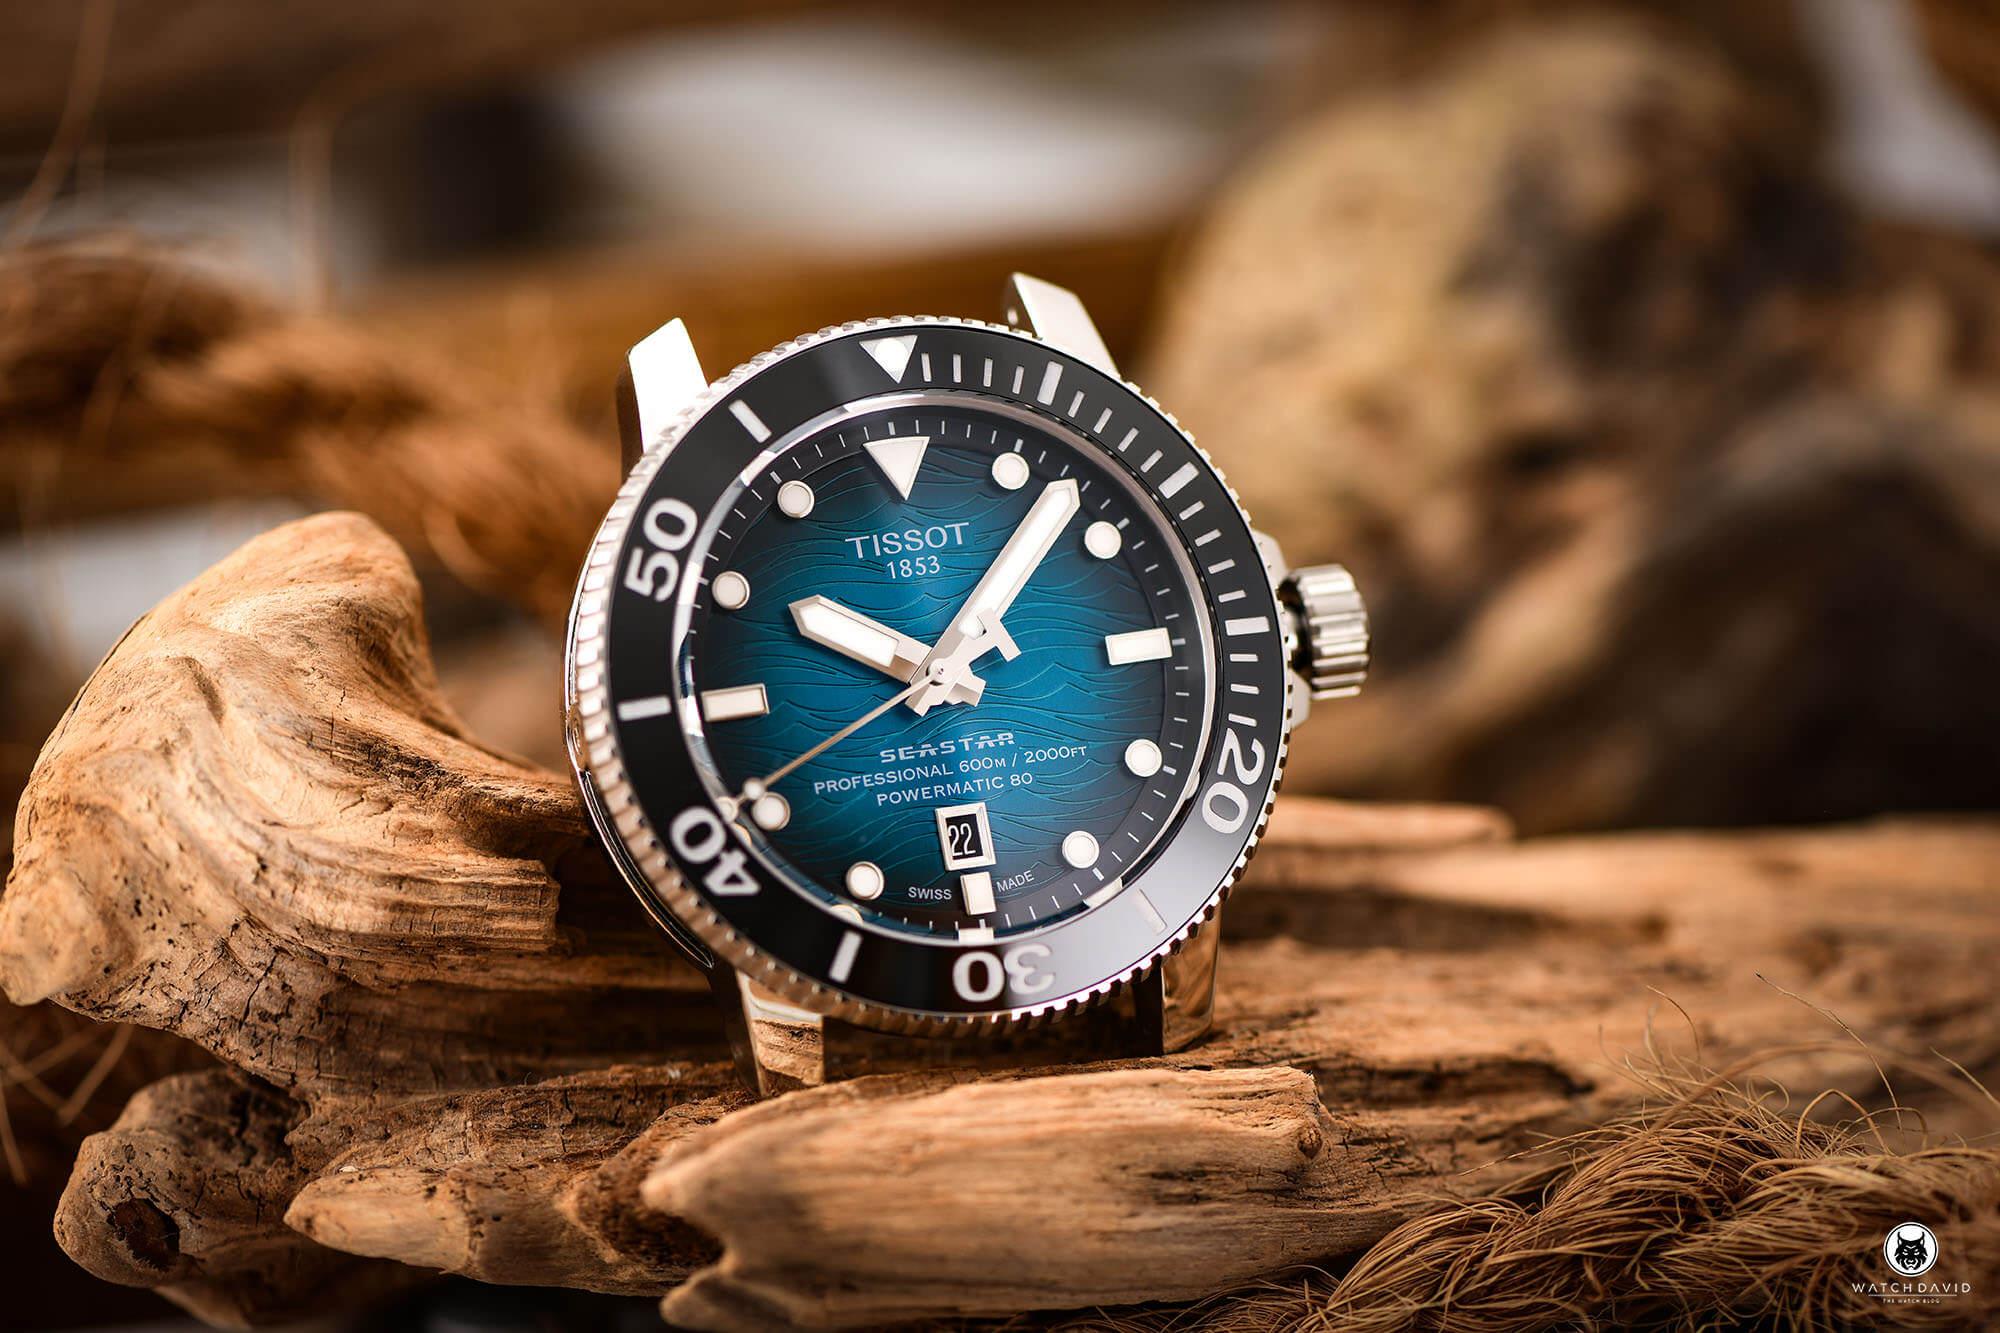 Meet the New Tissot 2000ft Seastar Professional Dive Watch